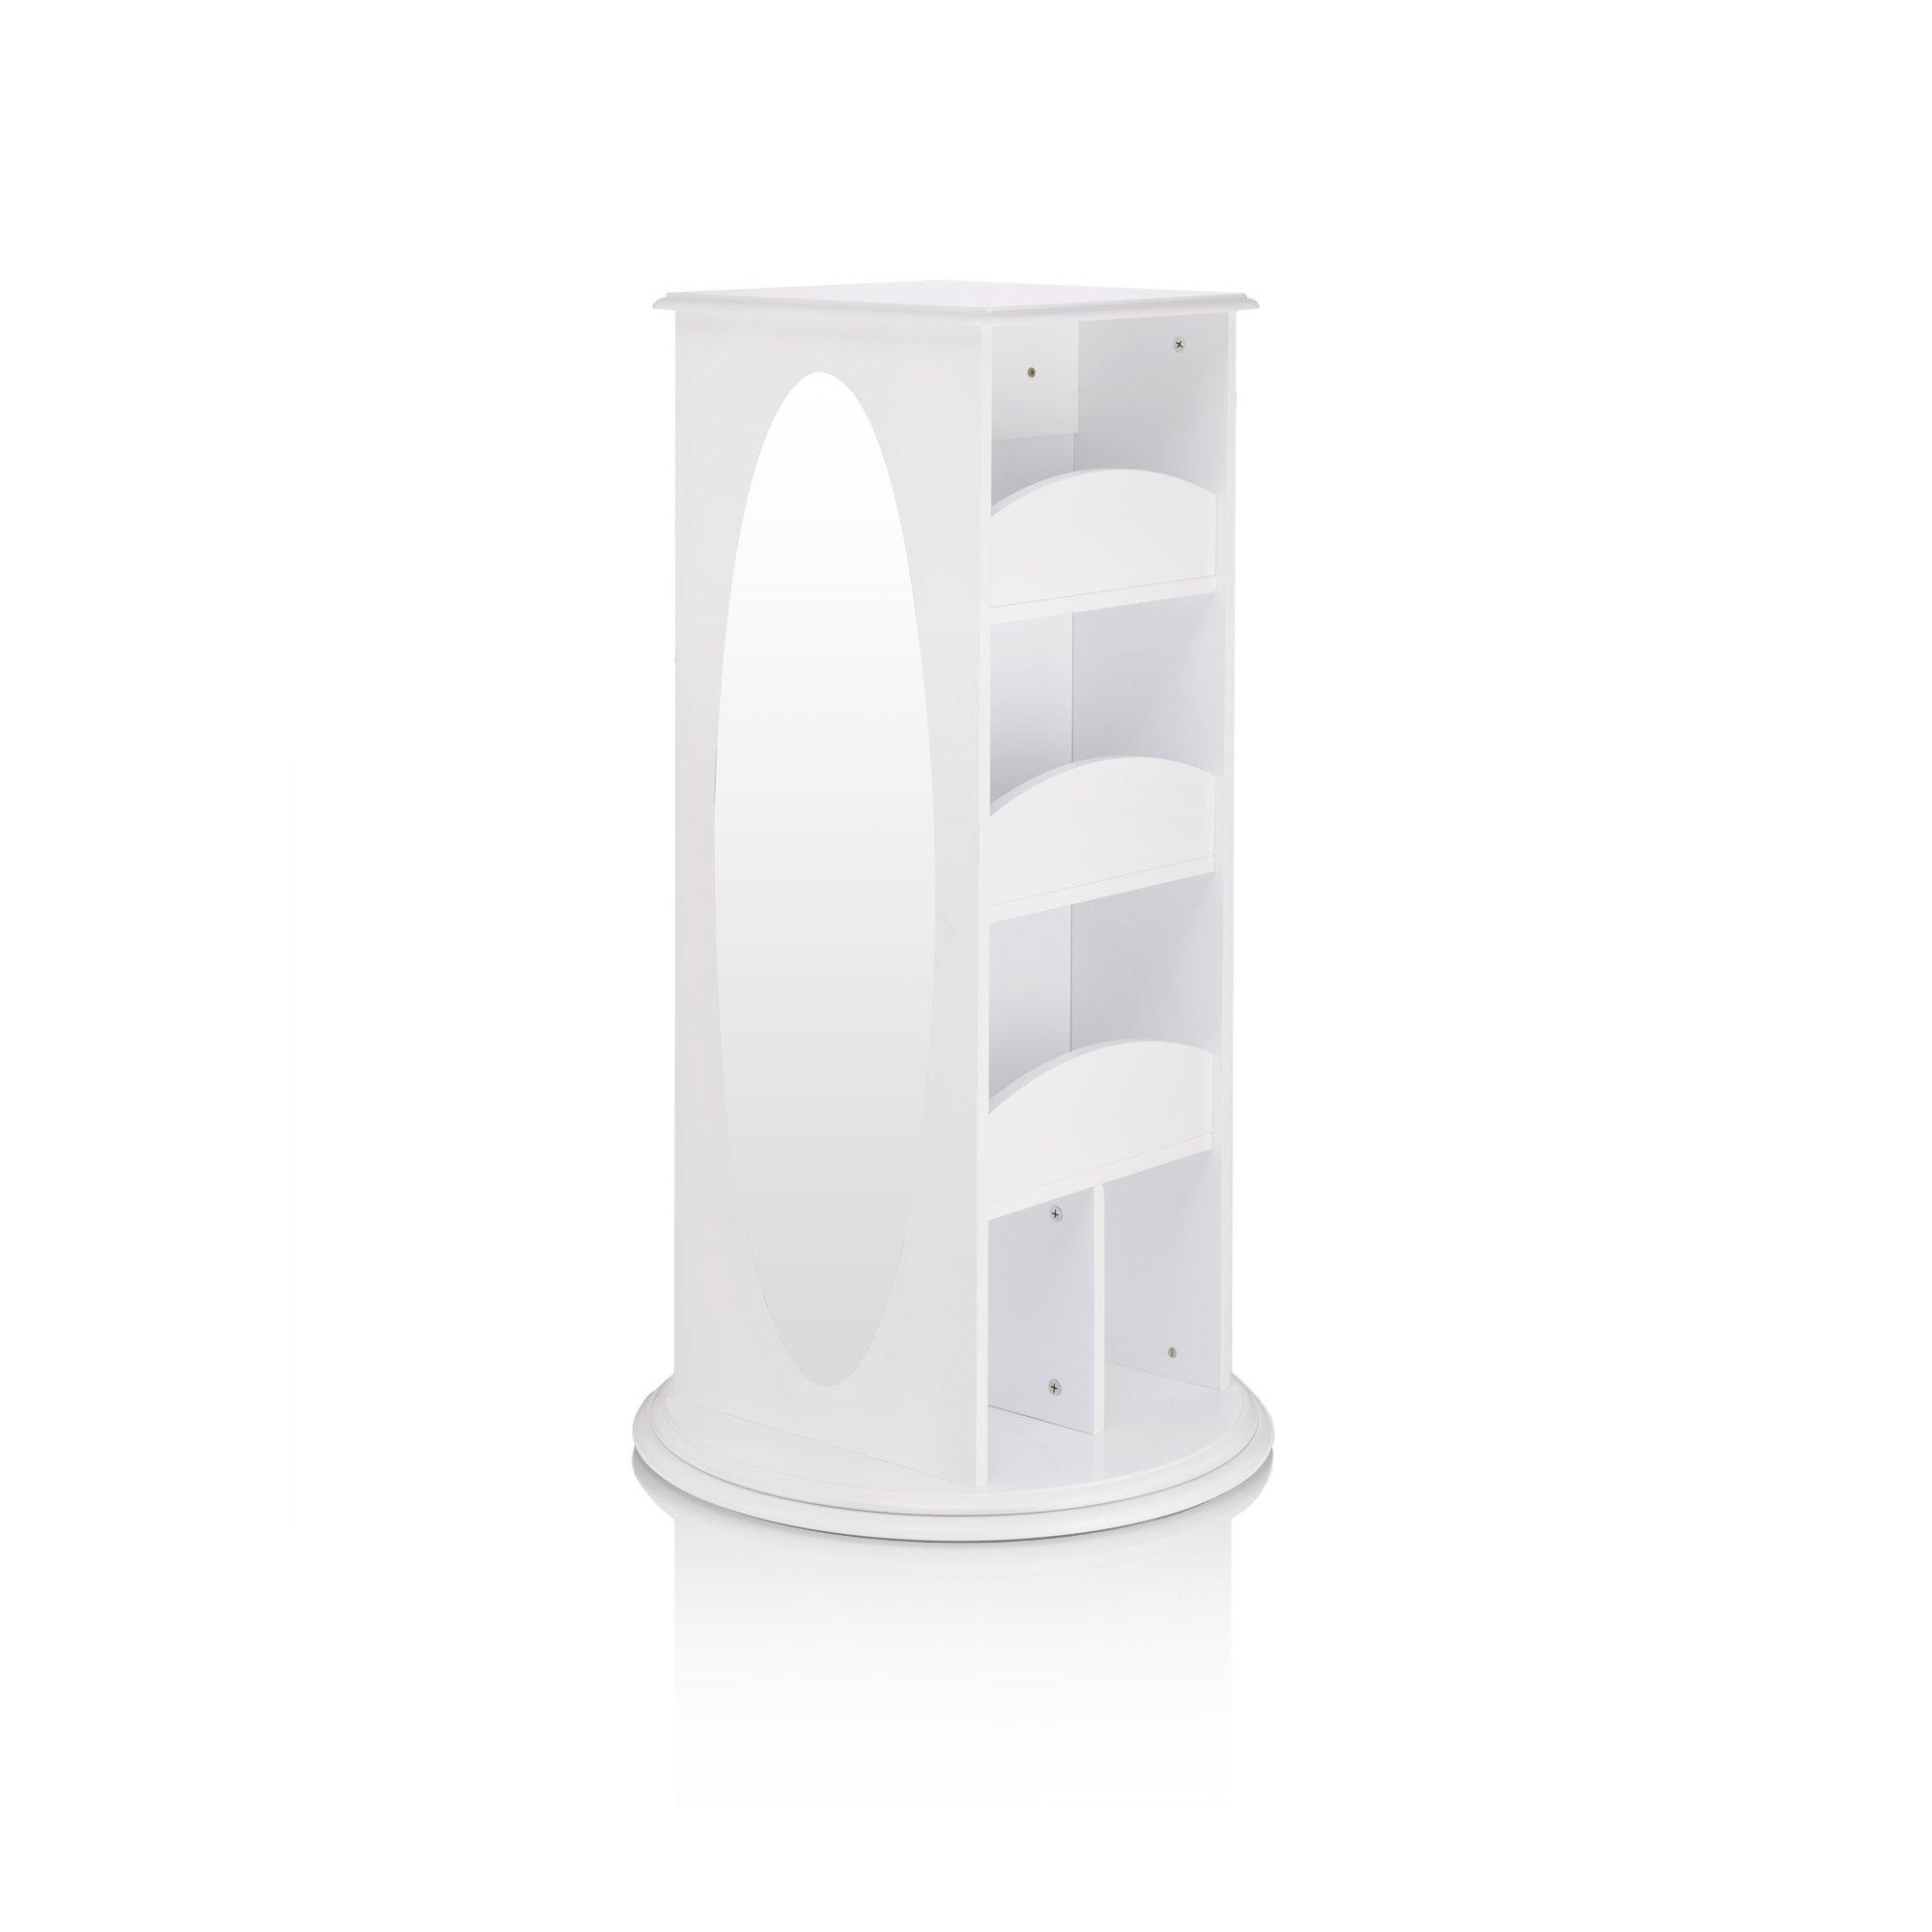 Guidecraft Rotating Dress-Up Storage Center White - Armoire, Dresser Kids' Furniture